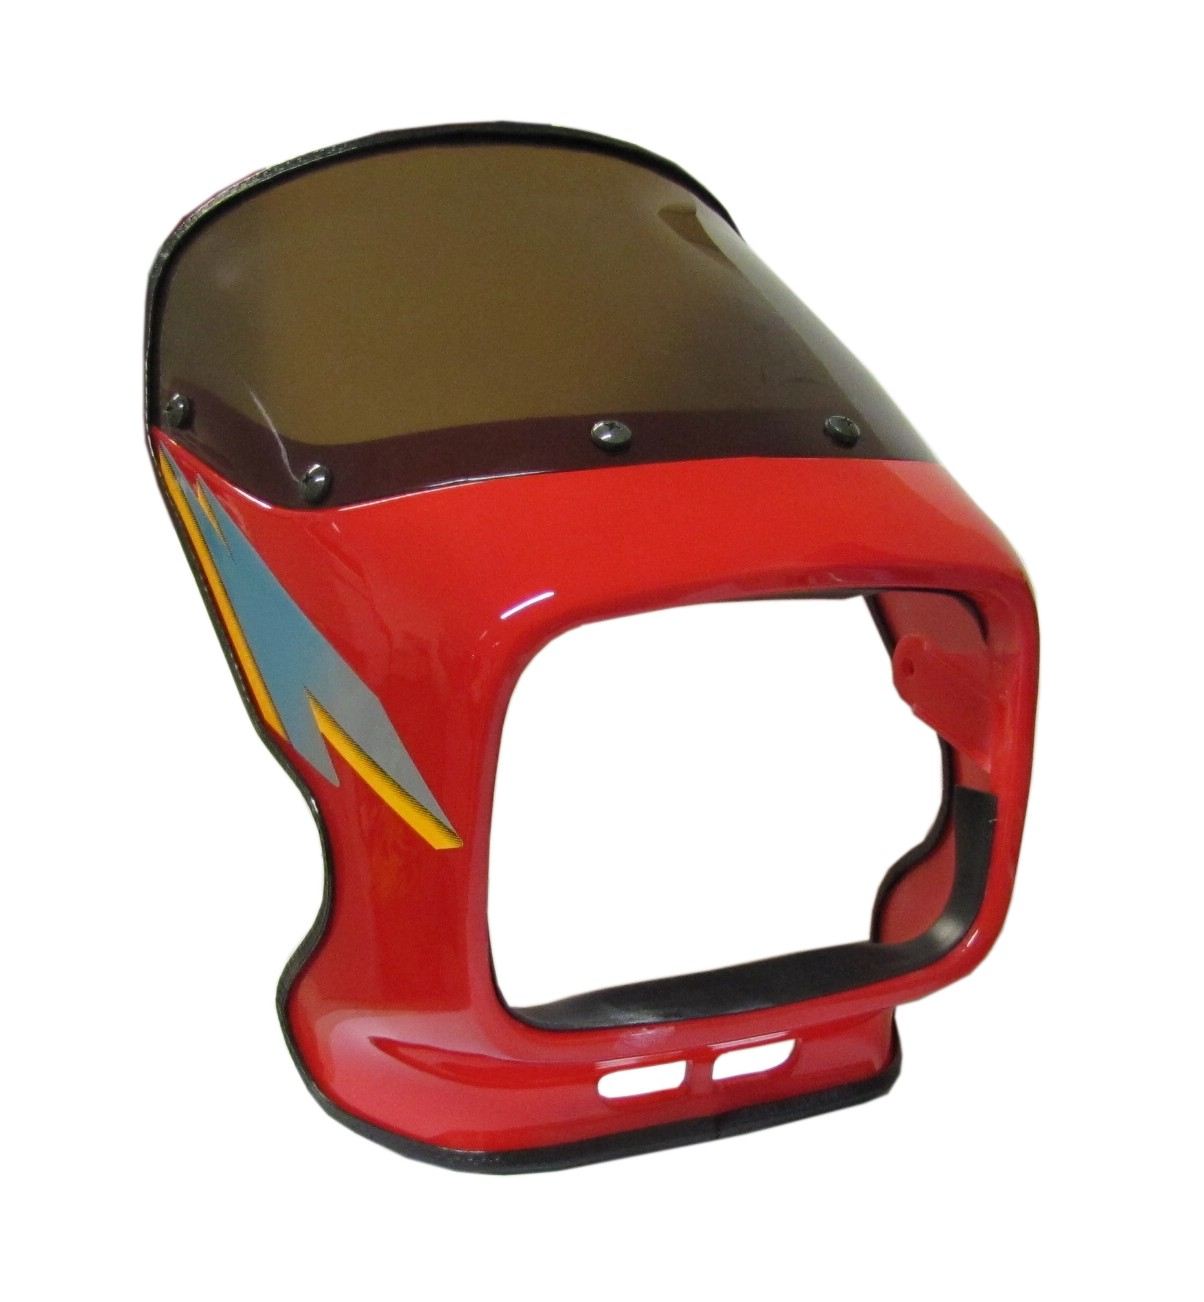 Headlight-Fairing-Fits-Suzuki-GS125-Red-Each